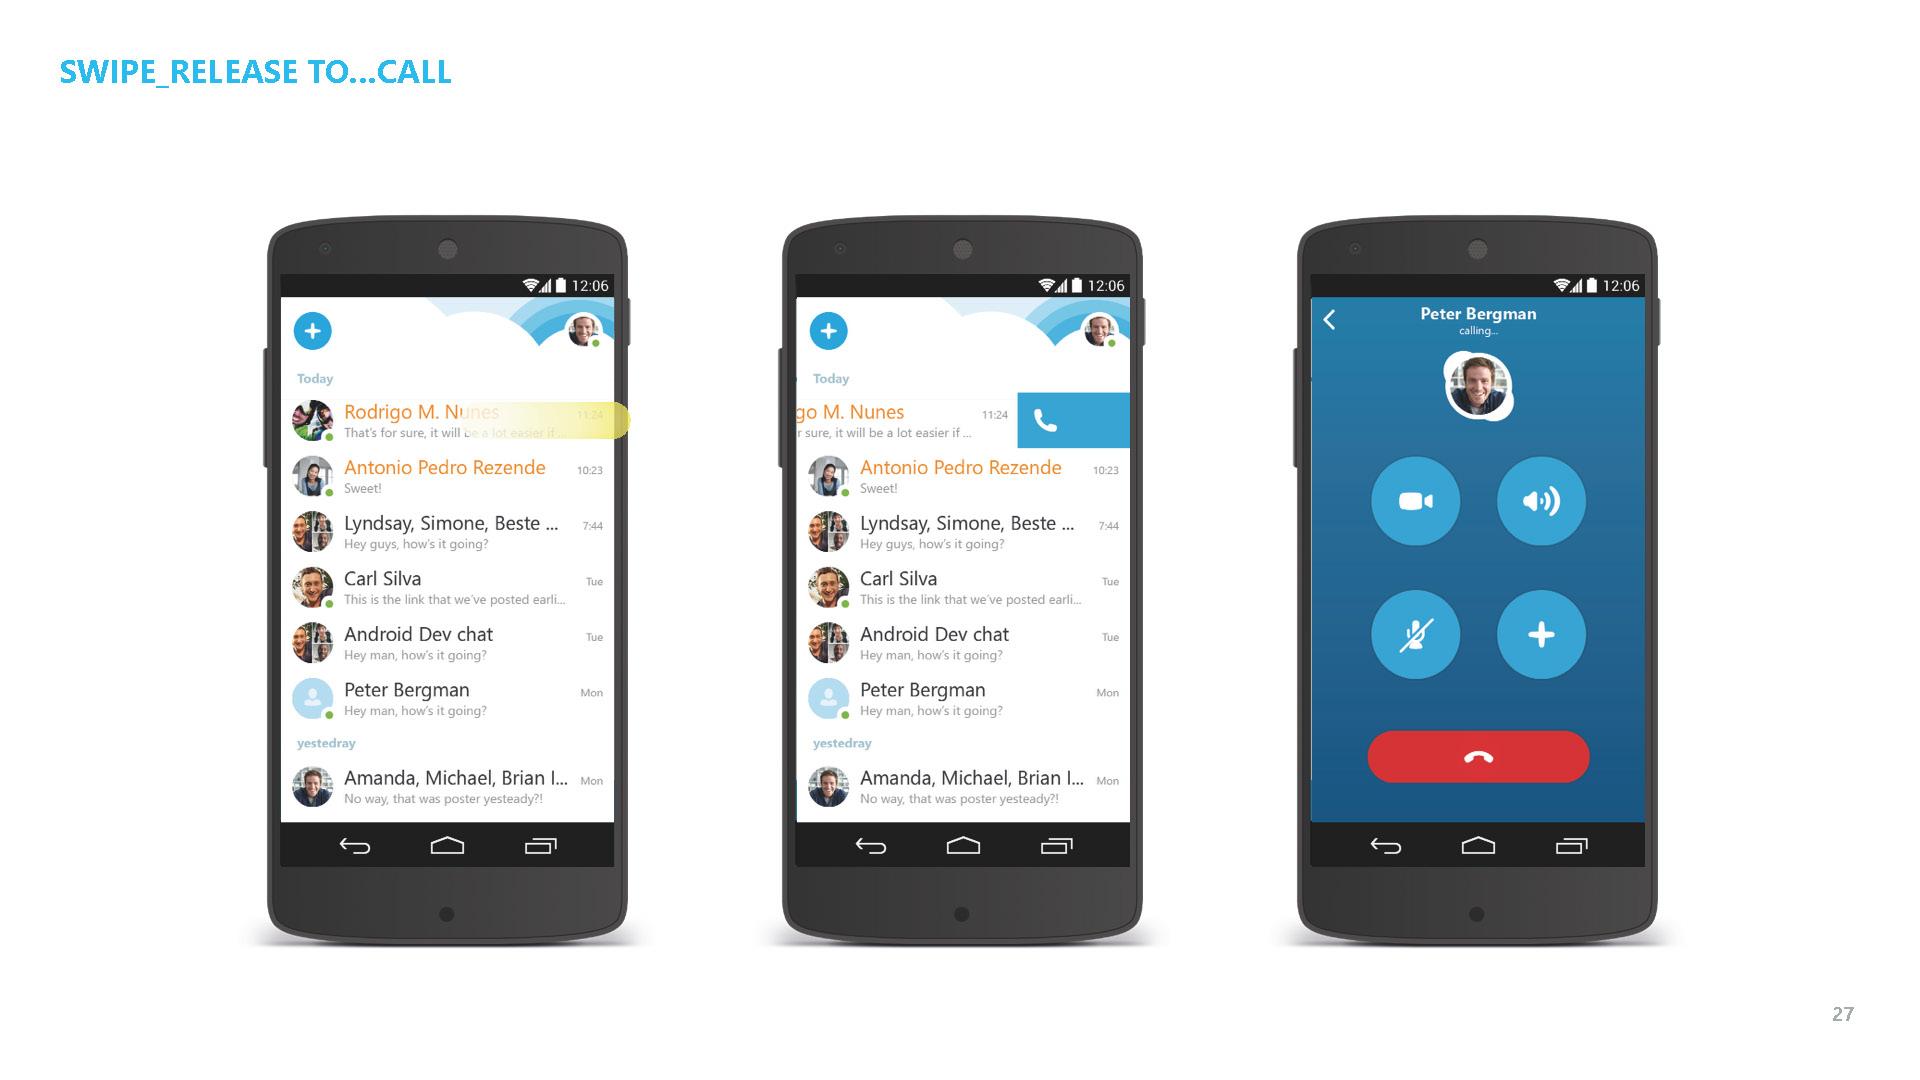 Mobile_UI_model_Page_27.jpg